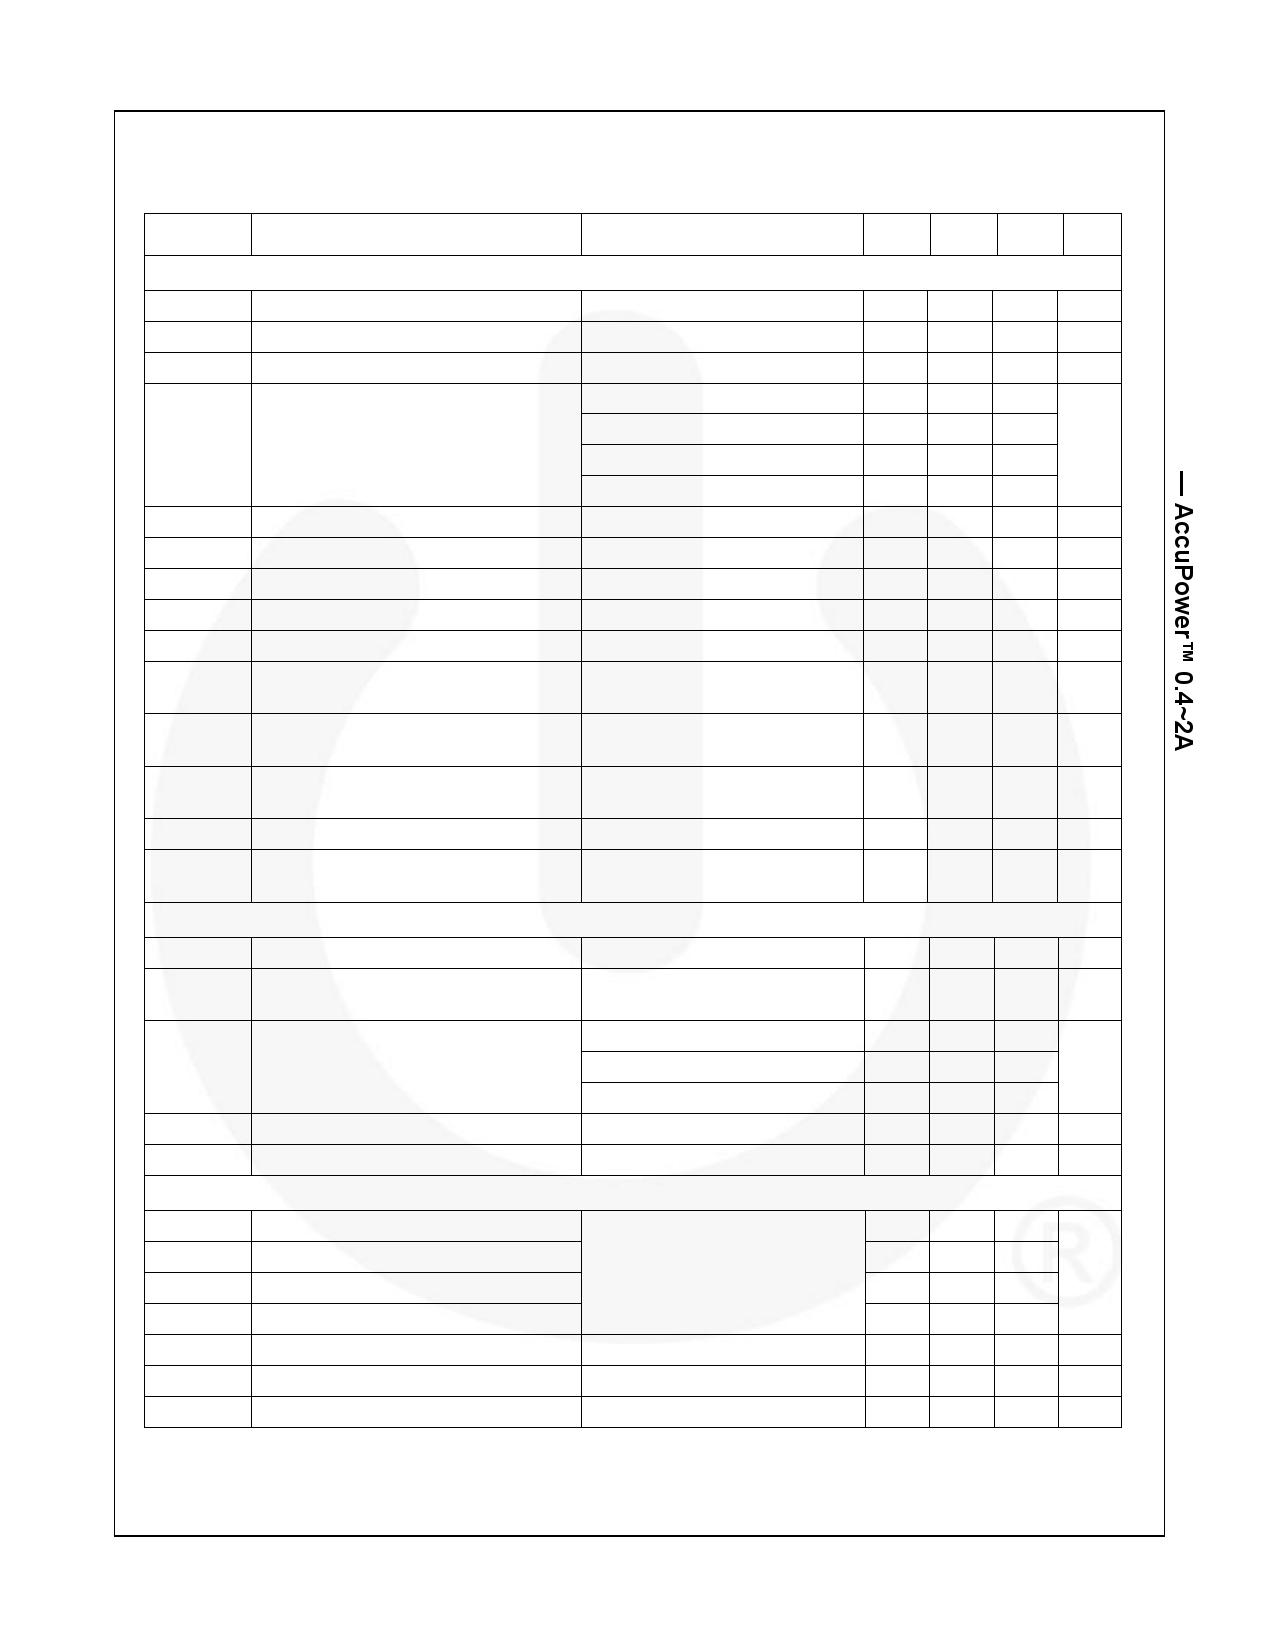 FPF2701 pdf, arduino